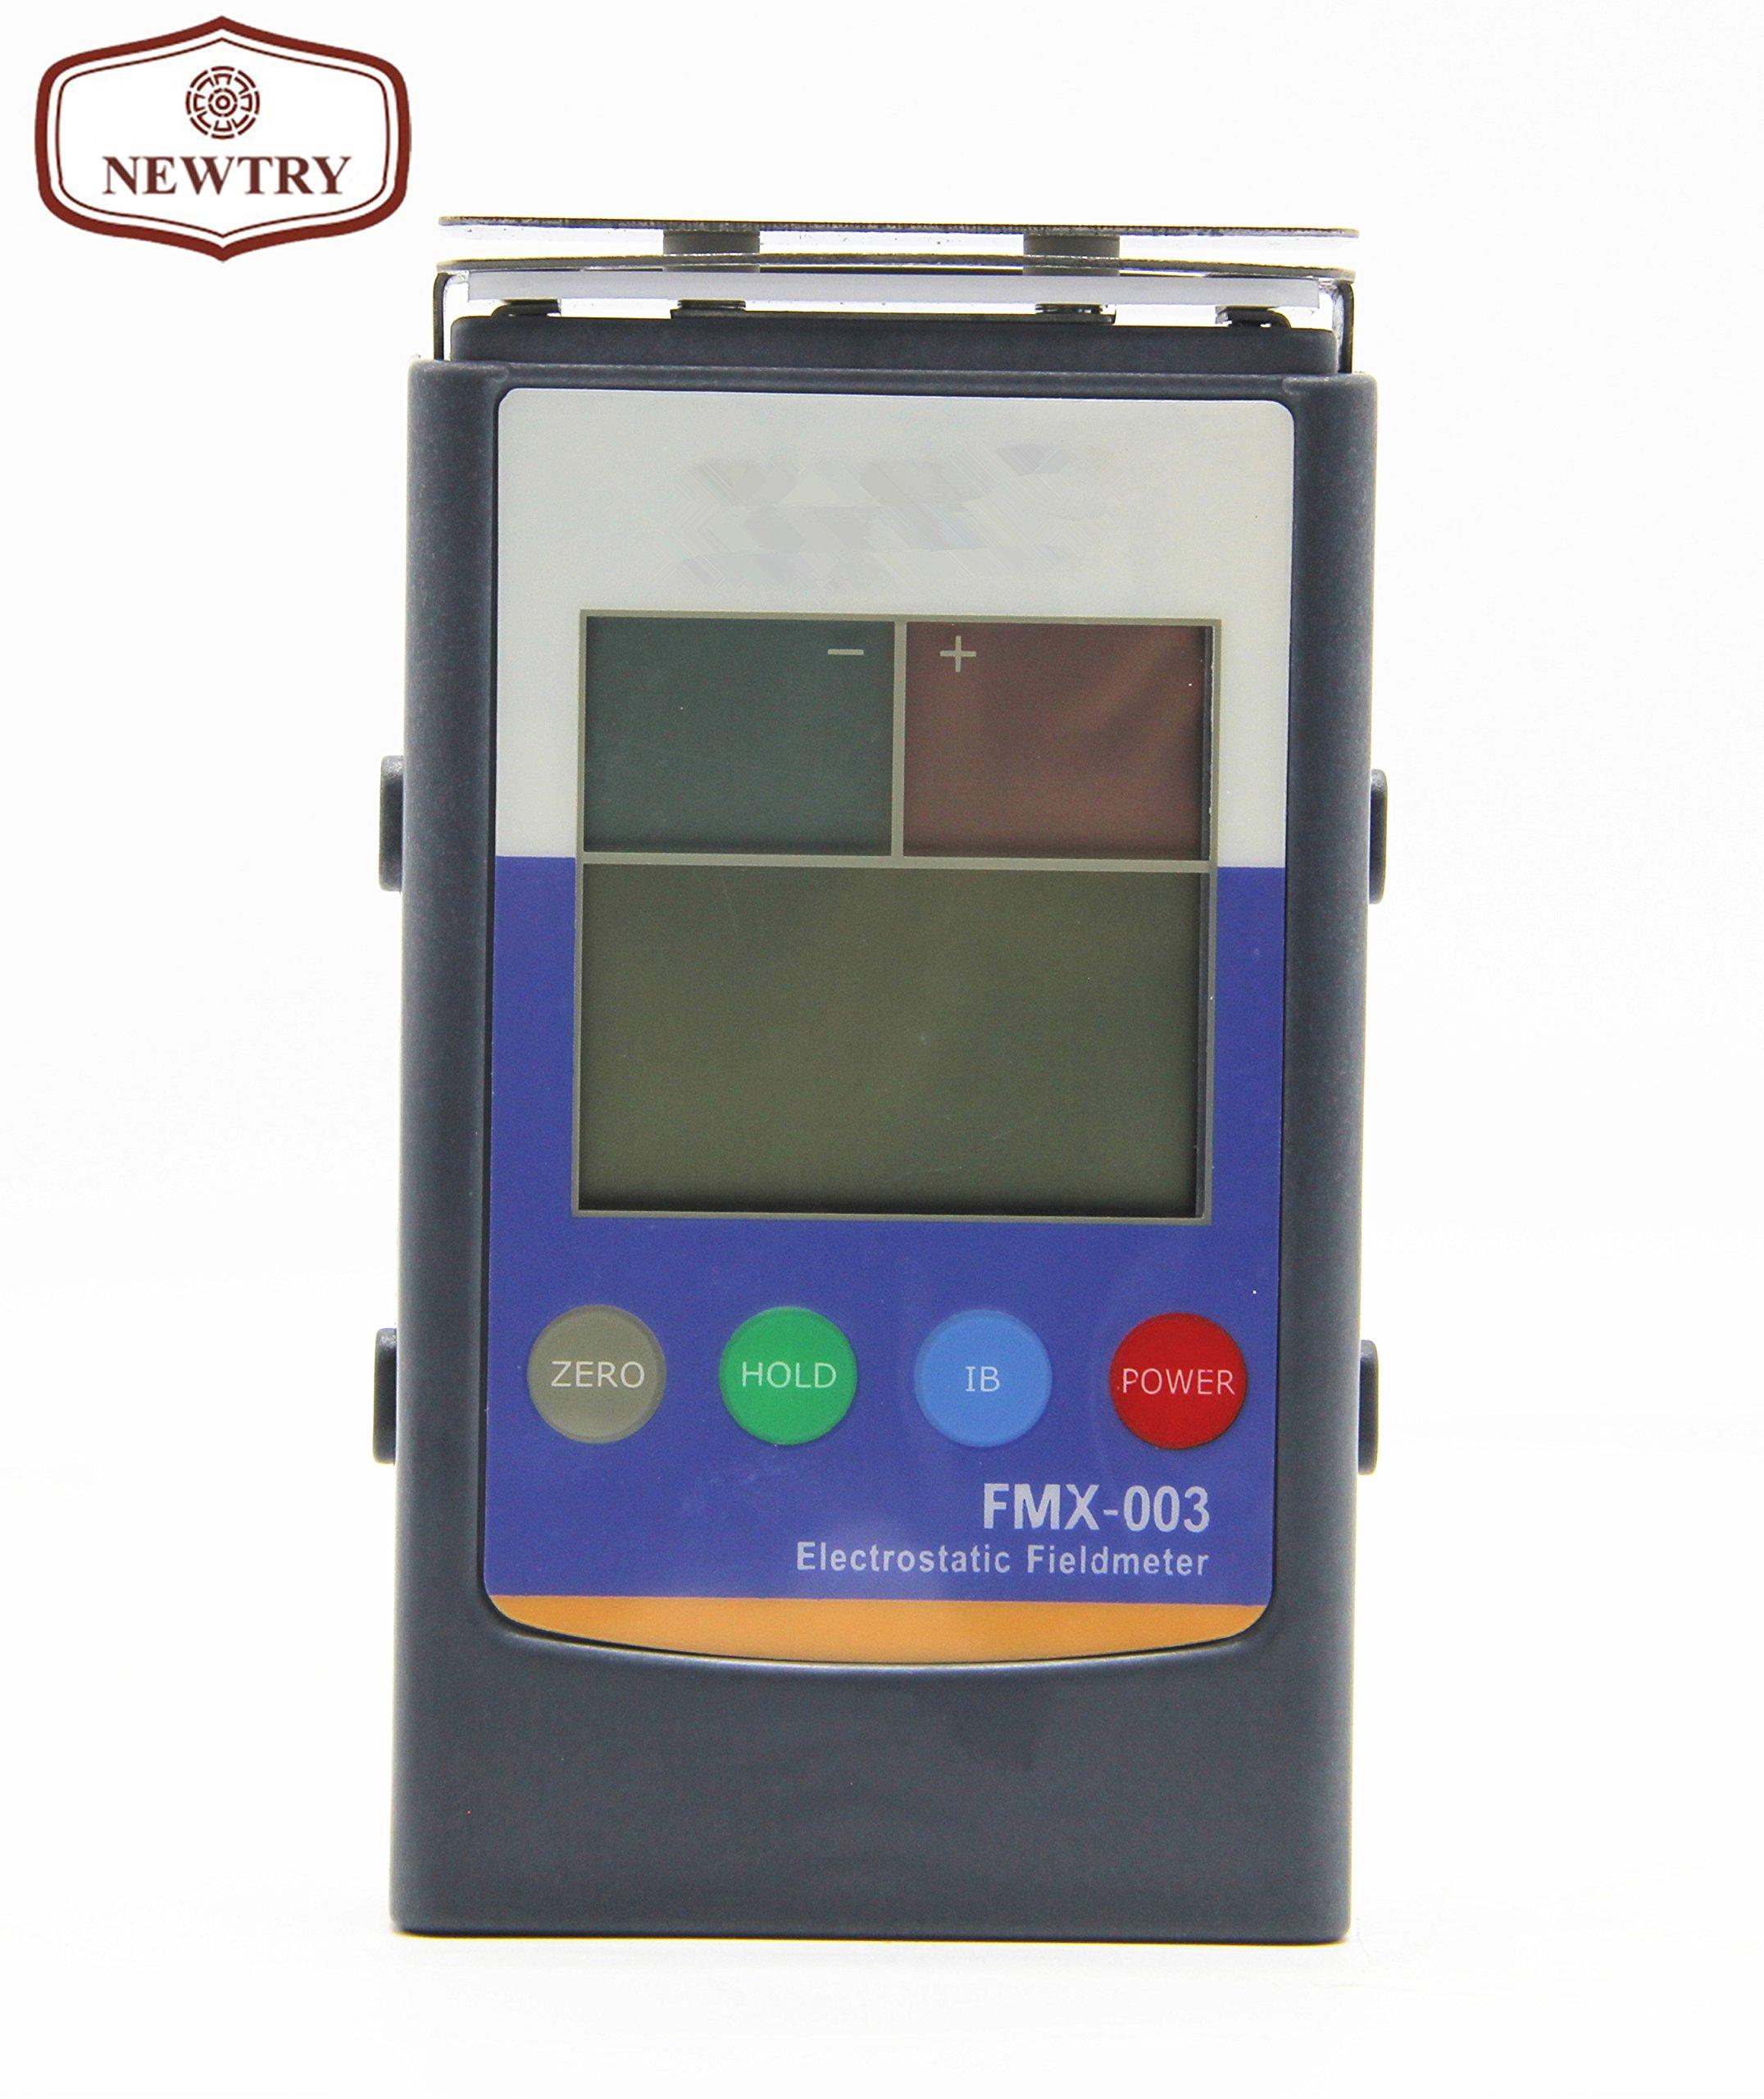 Electrostatic Tester Electrostatic Field Meter FMX003